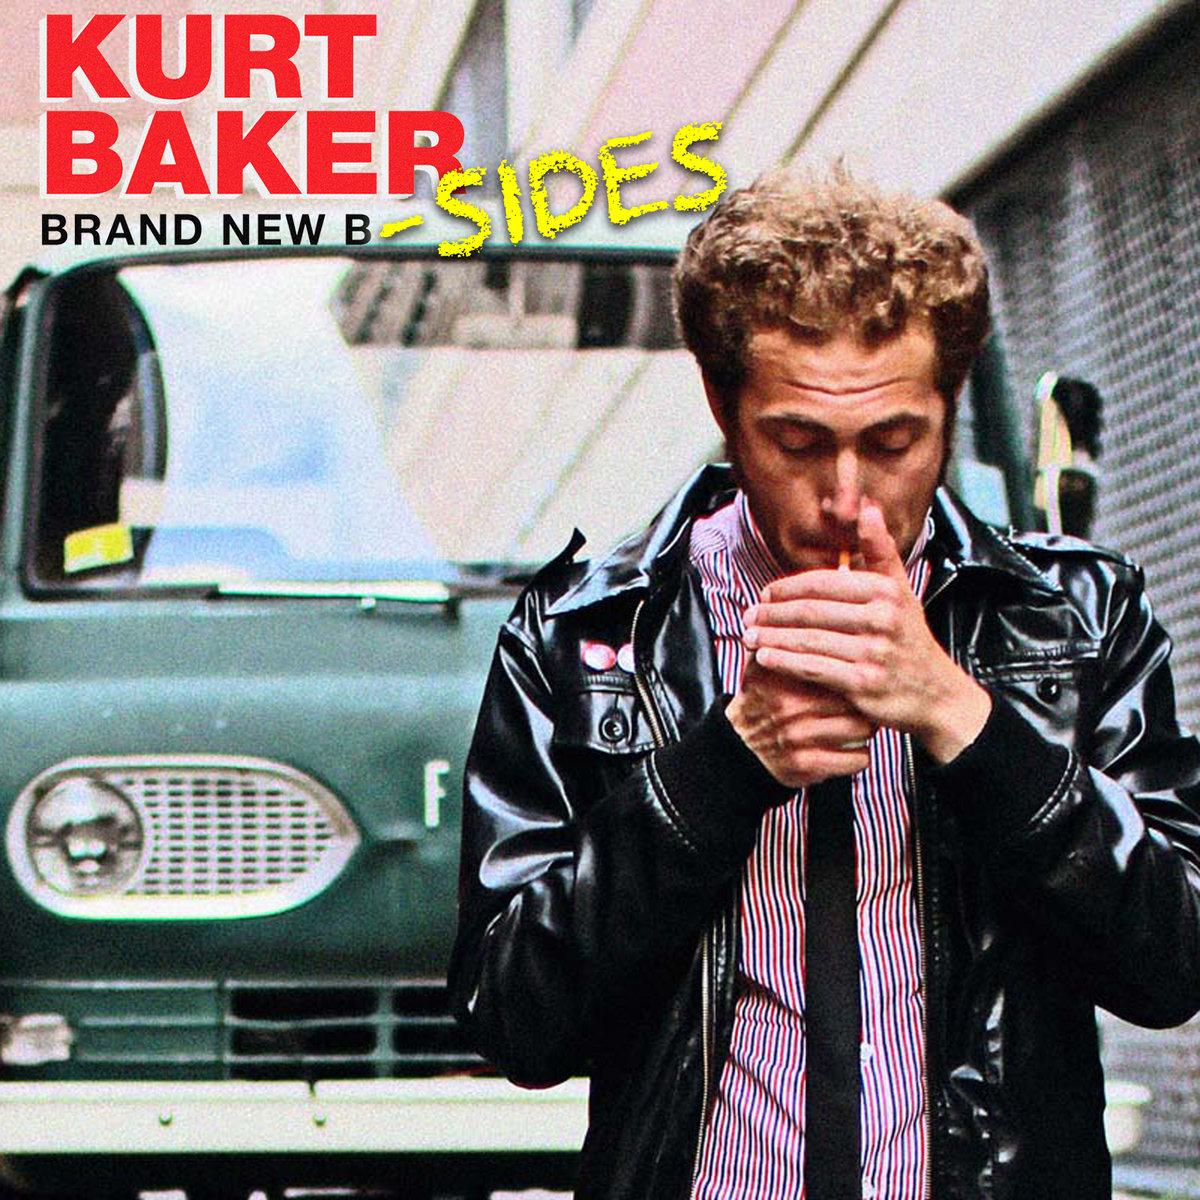 Brand New B-Sides - Listen, Reviews, Buy It!